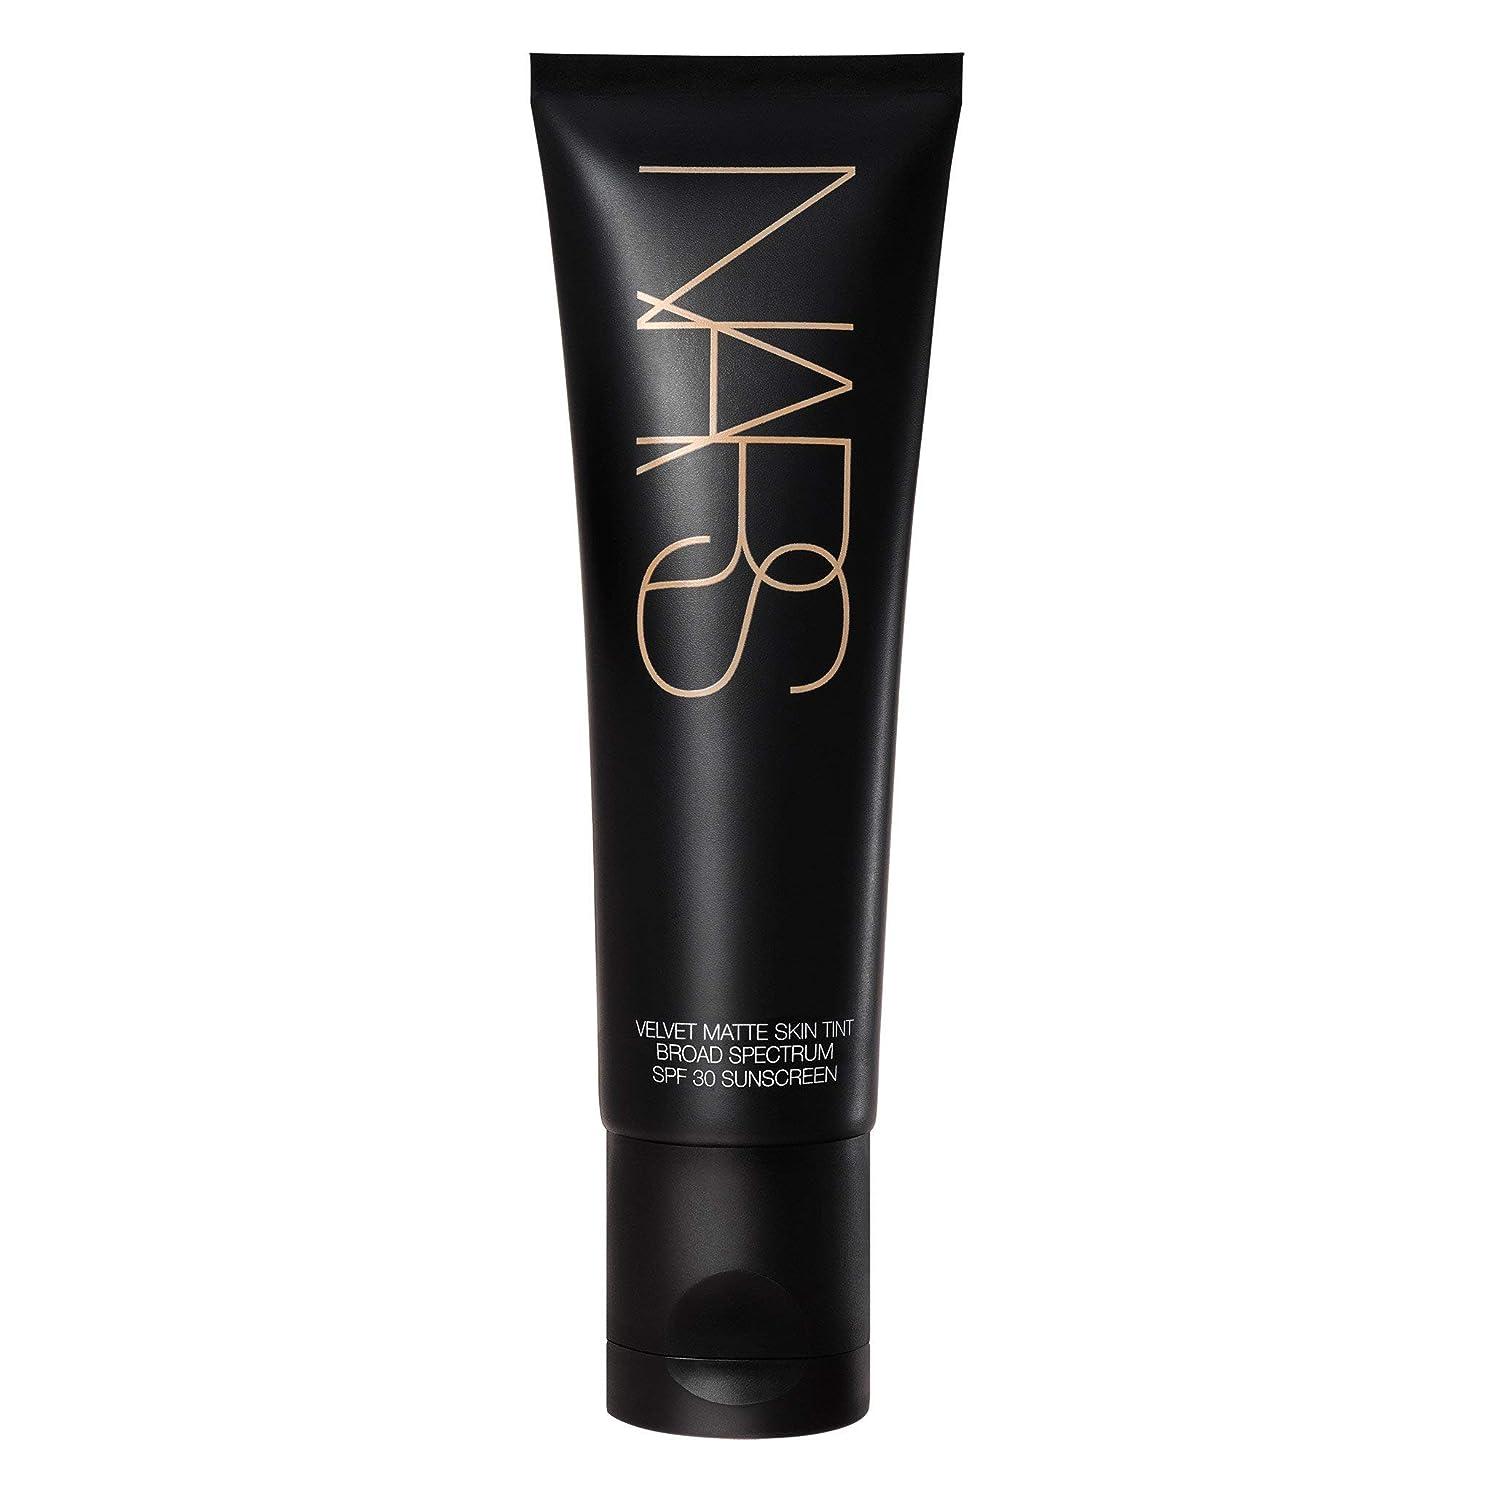 事業内容行商含むNars Velvet Matte Skin Tint Spf 30, Terre Neuve -light, 1.7 Ounce [並行輸入品]